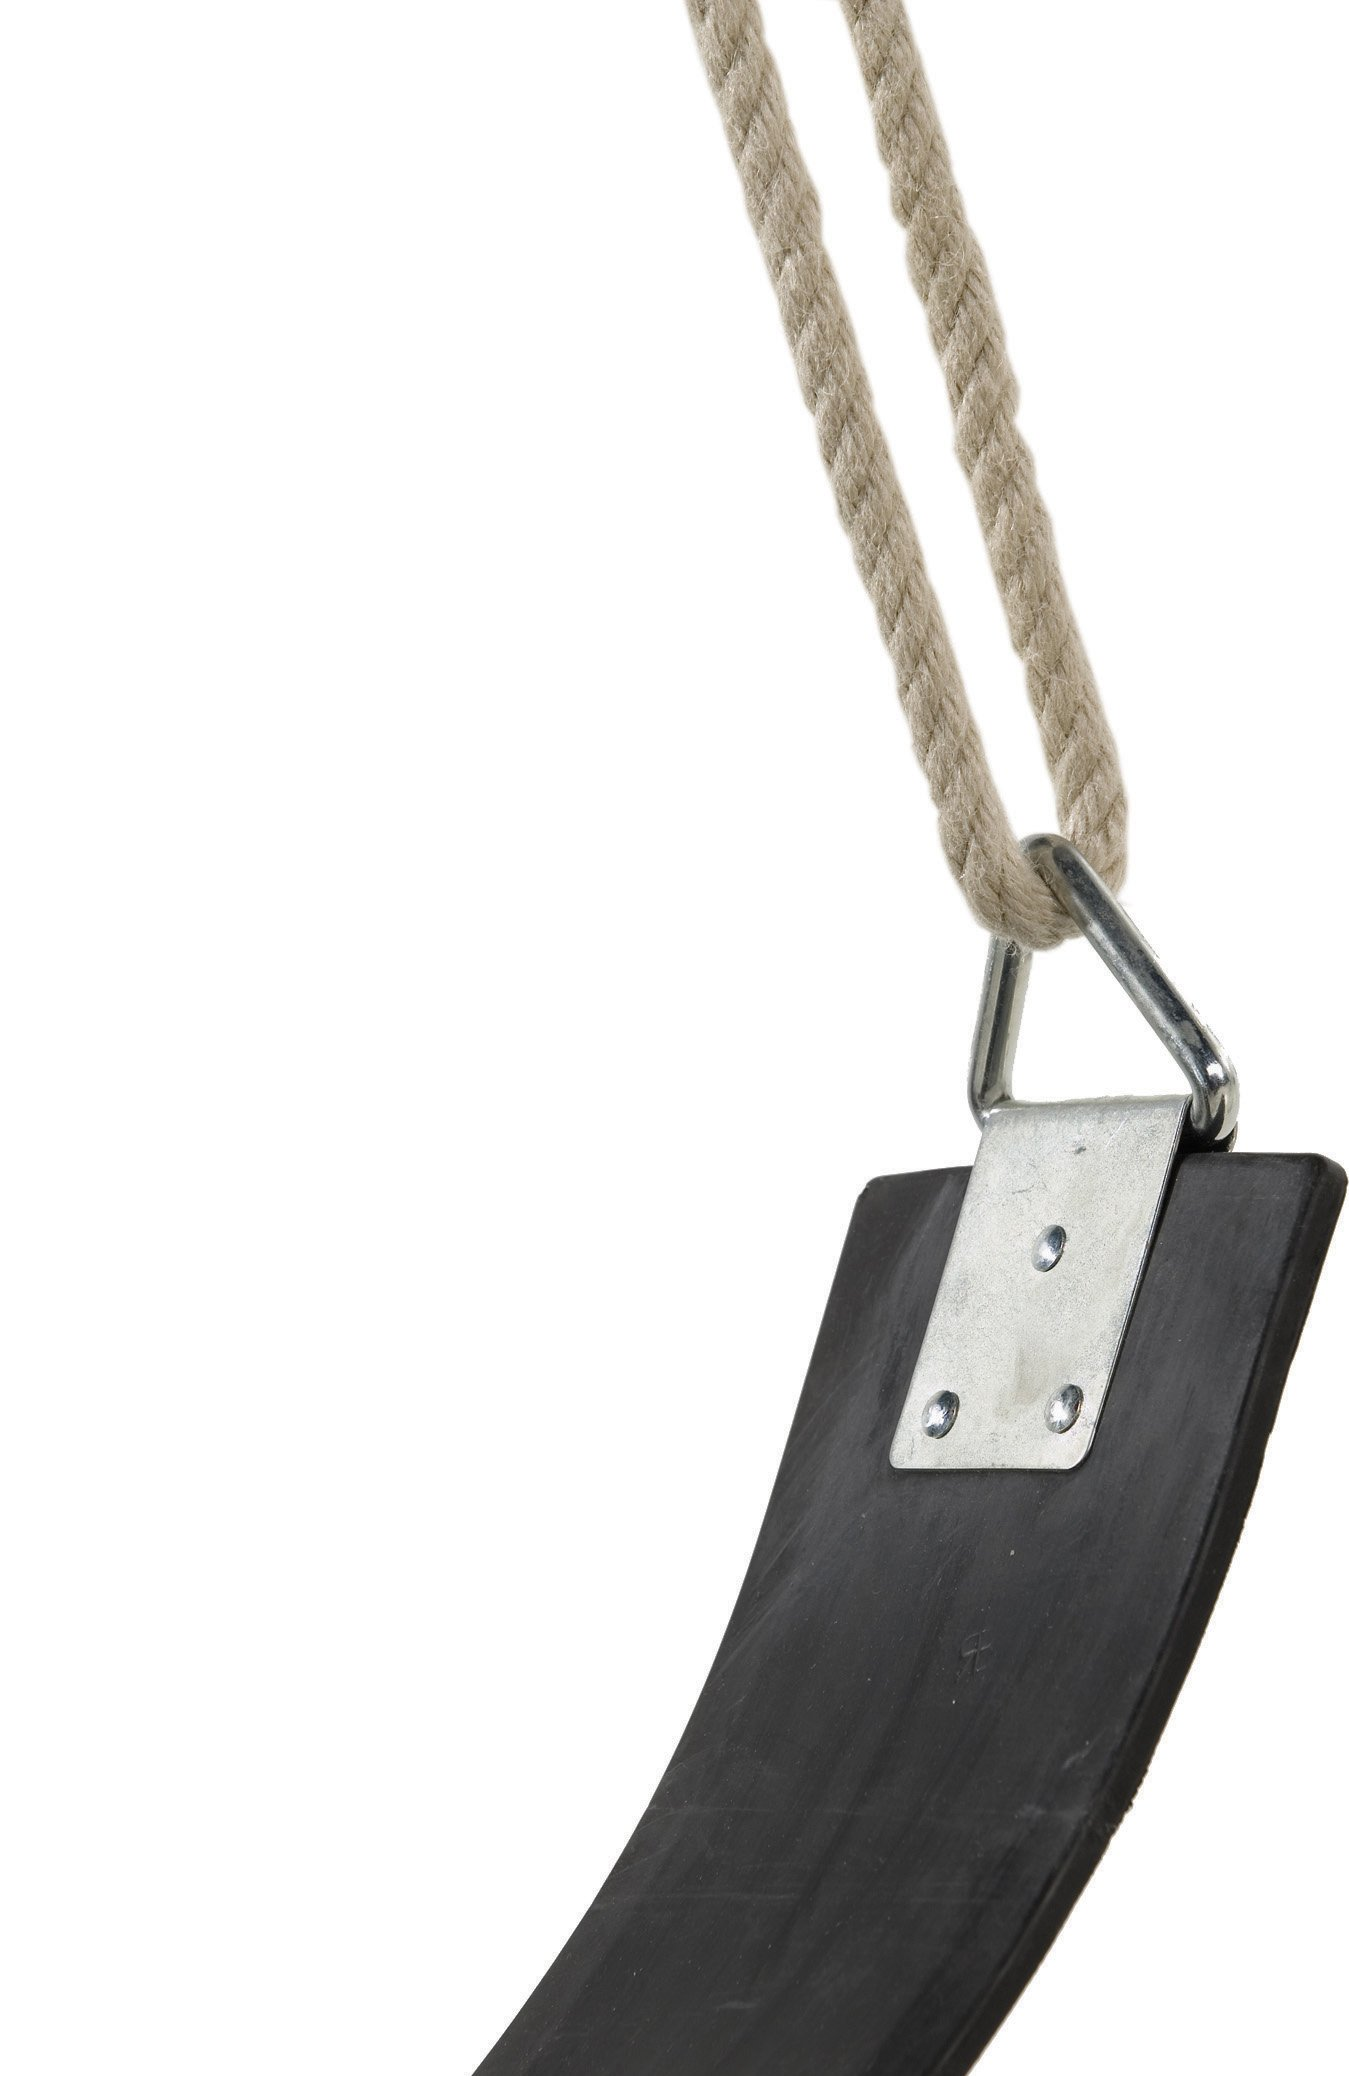 Coast Athletic Commercial Grade Heavy Duty Swing Seat | Heavy Duty Playground Swing Seats (Black)